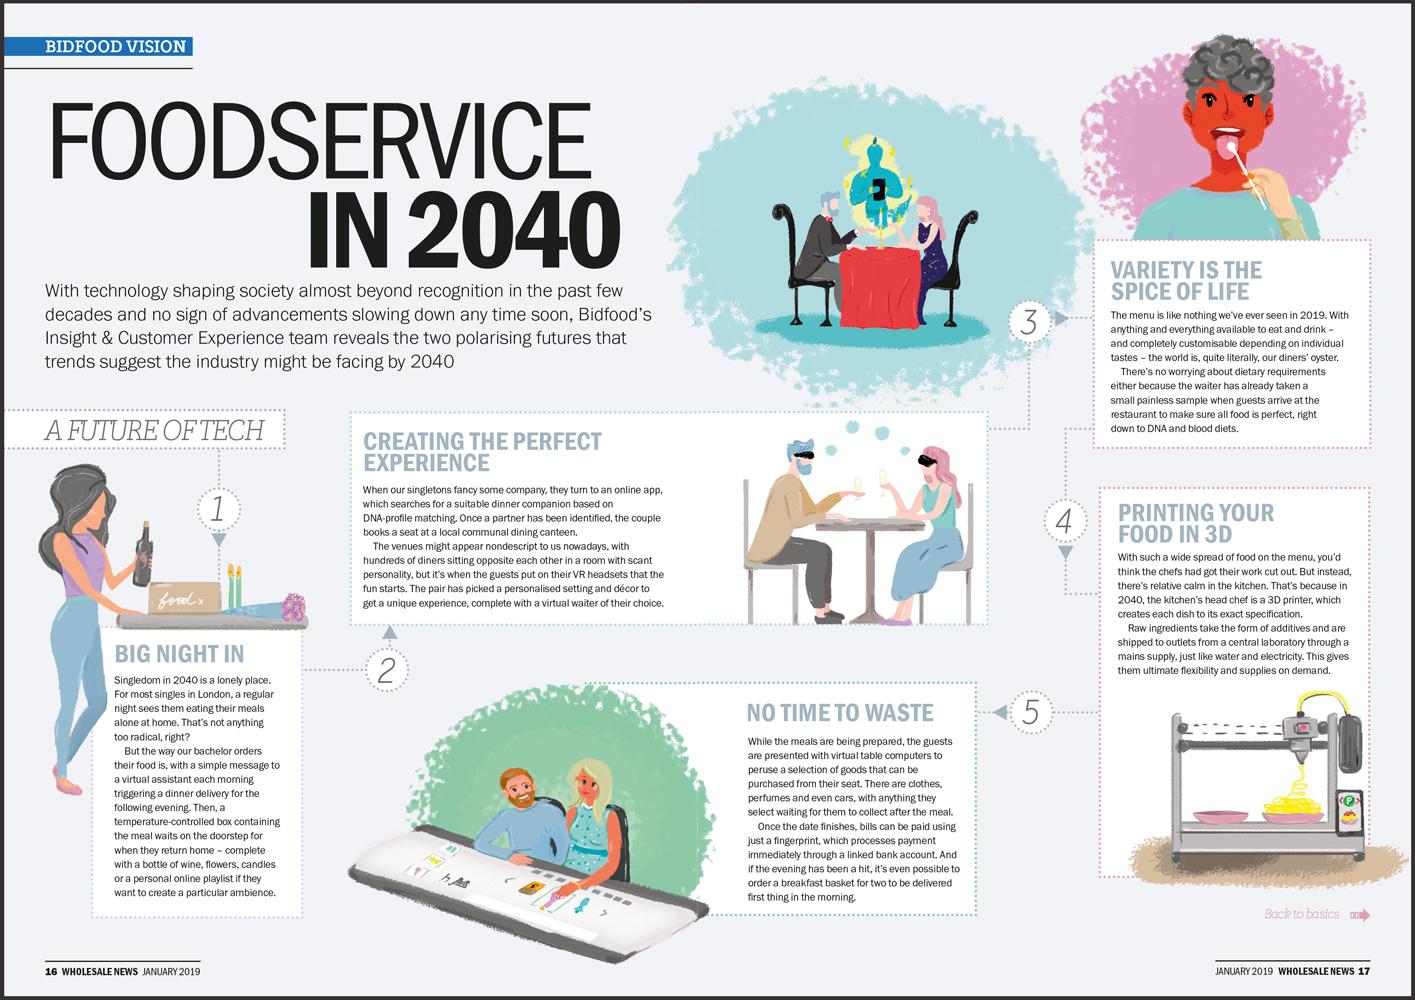 Bidfood's 2040 foodservice vision